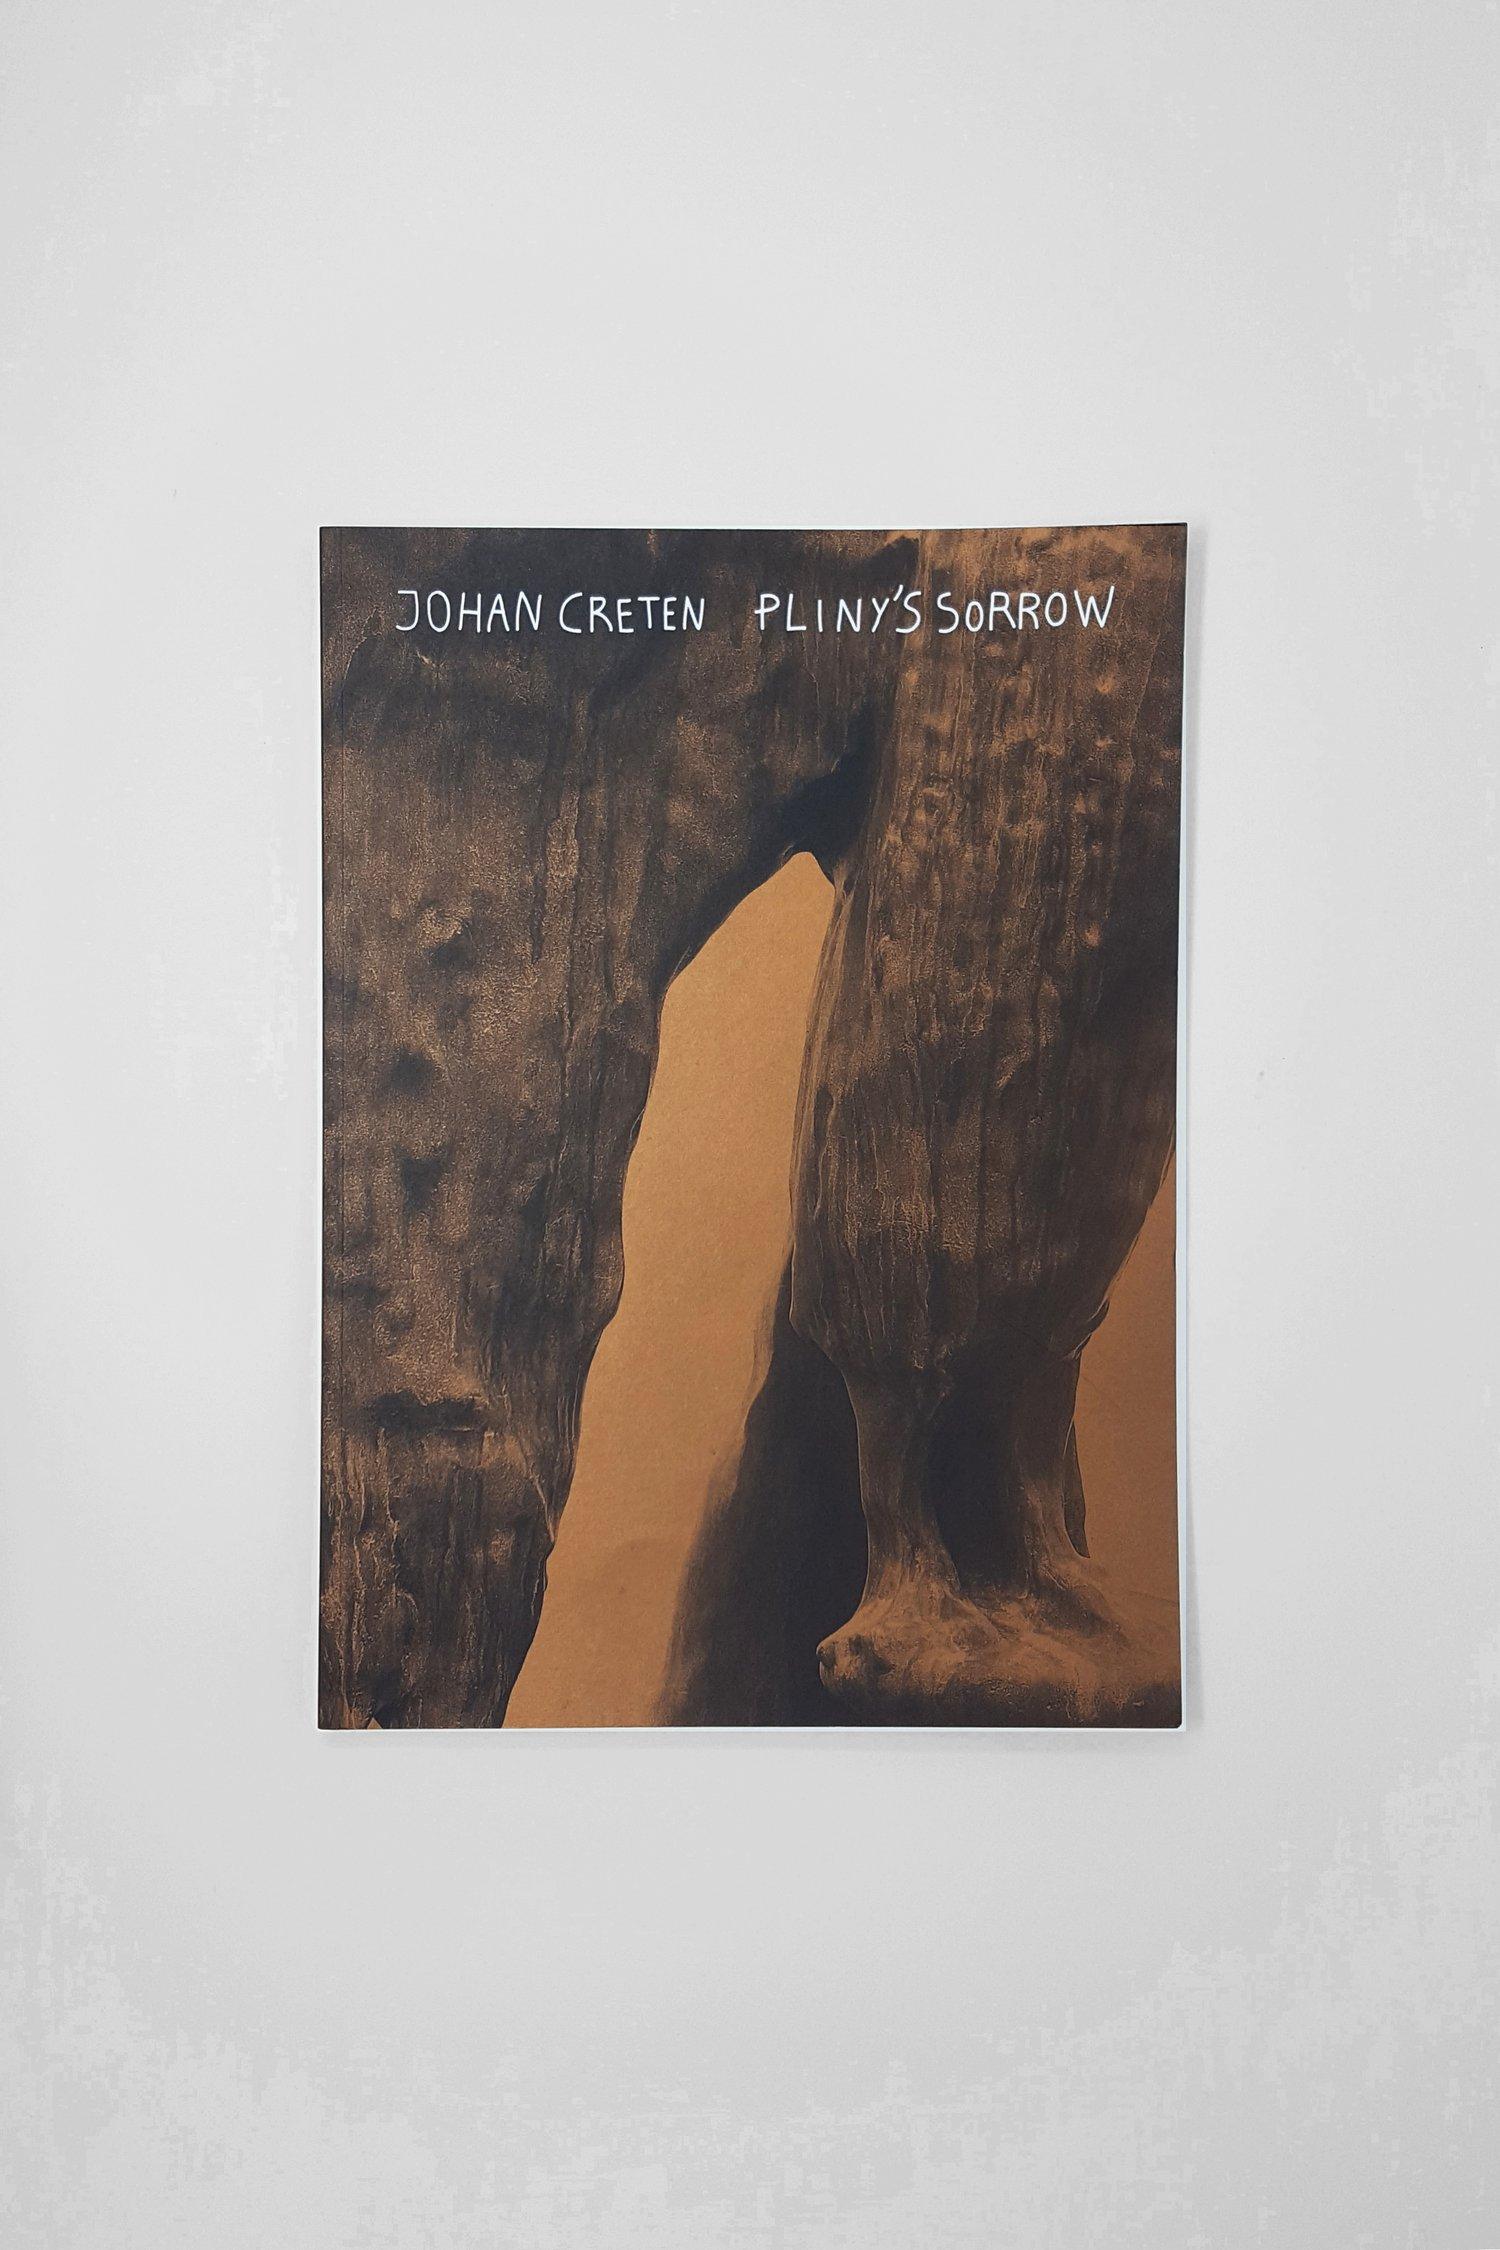 Image of Johan Creten - Pliny's Sorrow